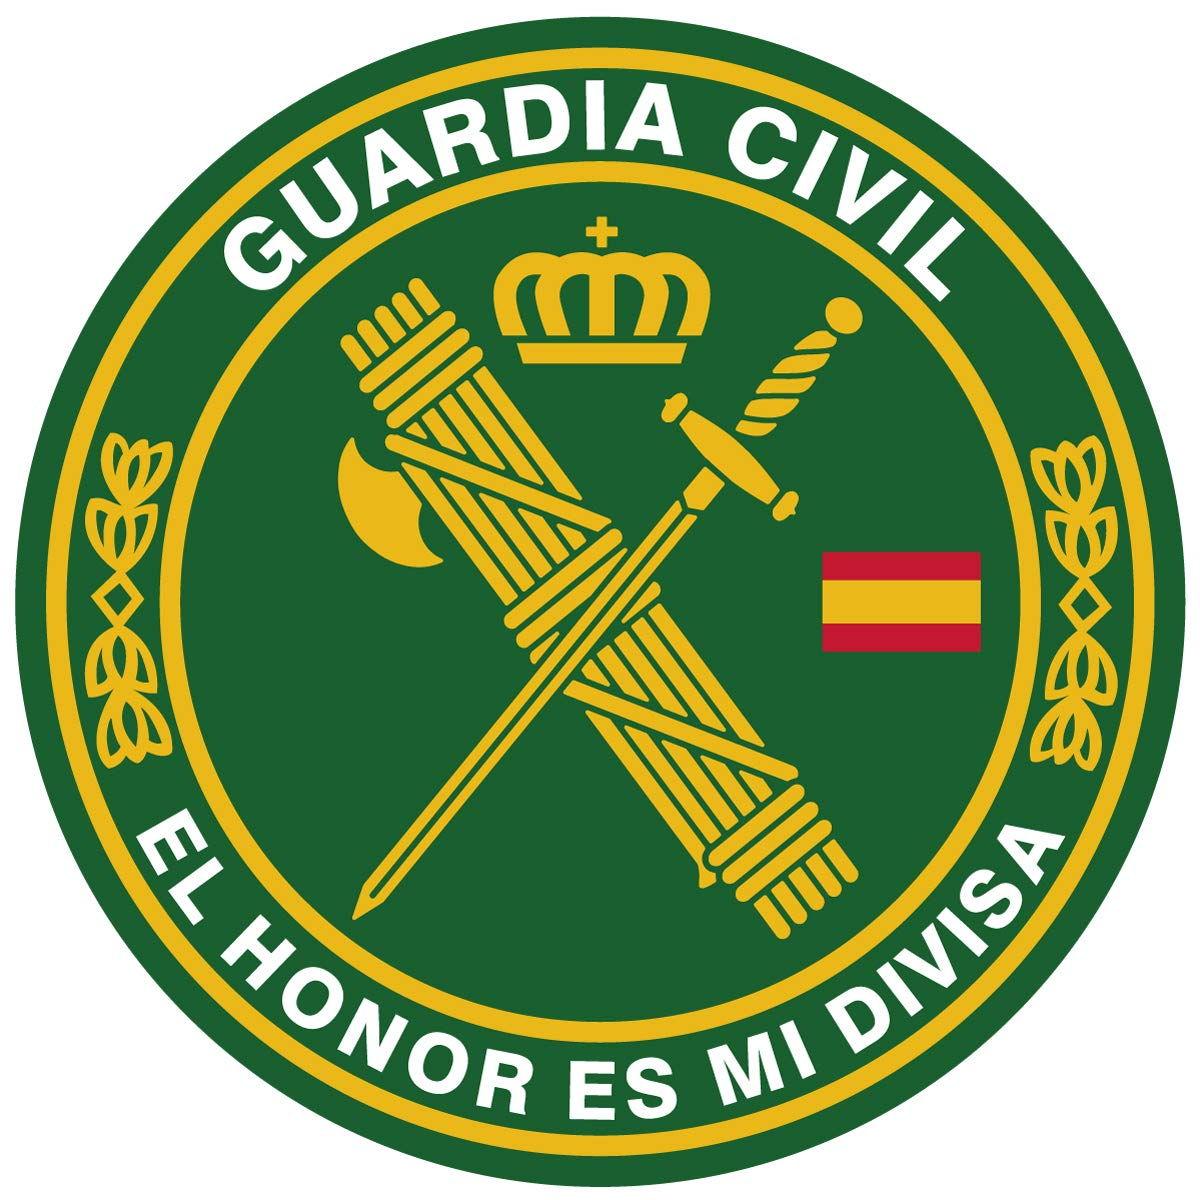 Artimagen Alfombrilla, Mouse Pad Textil 100% Poliéster Guardia Civil ø 20 cm.: Amazon.es: Electrónica